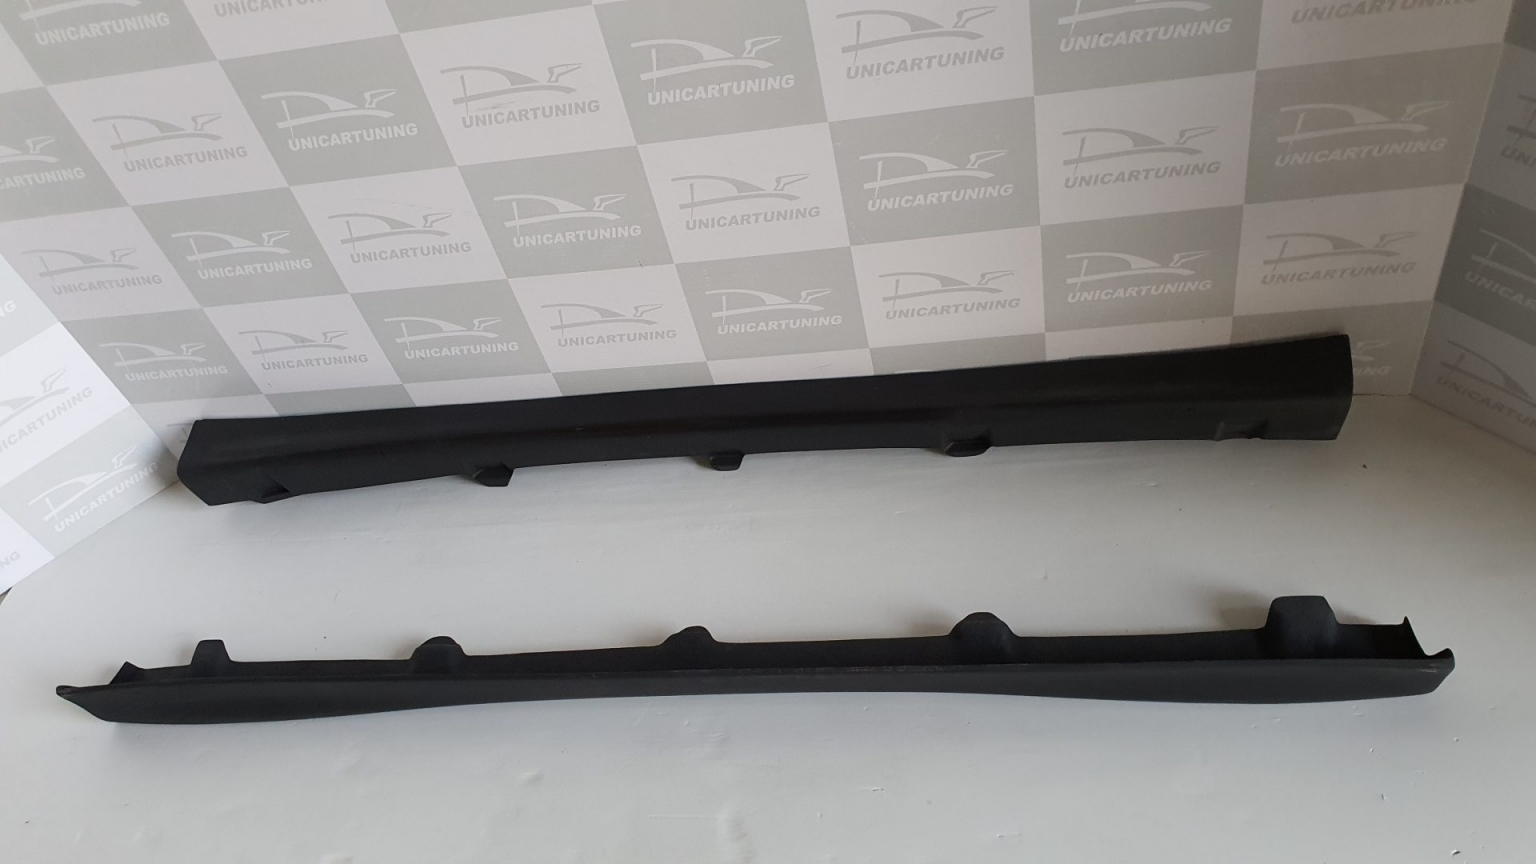 Seat-Ibiza-6K-6K2-93-01-Embaladeiras-GT-TDI-4